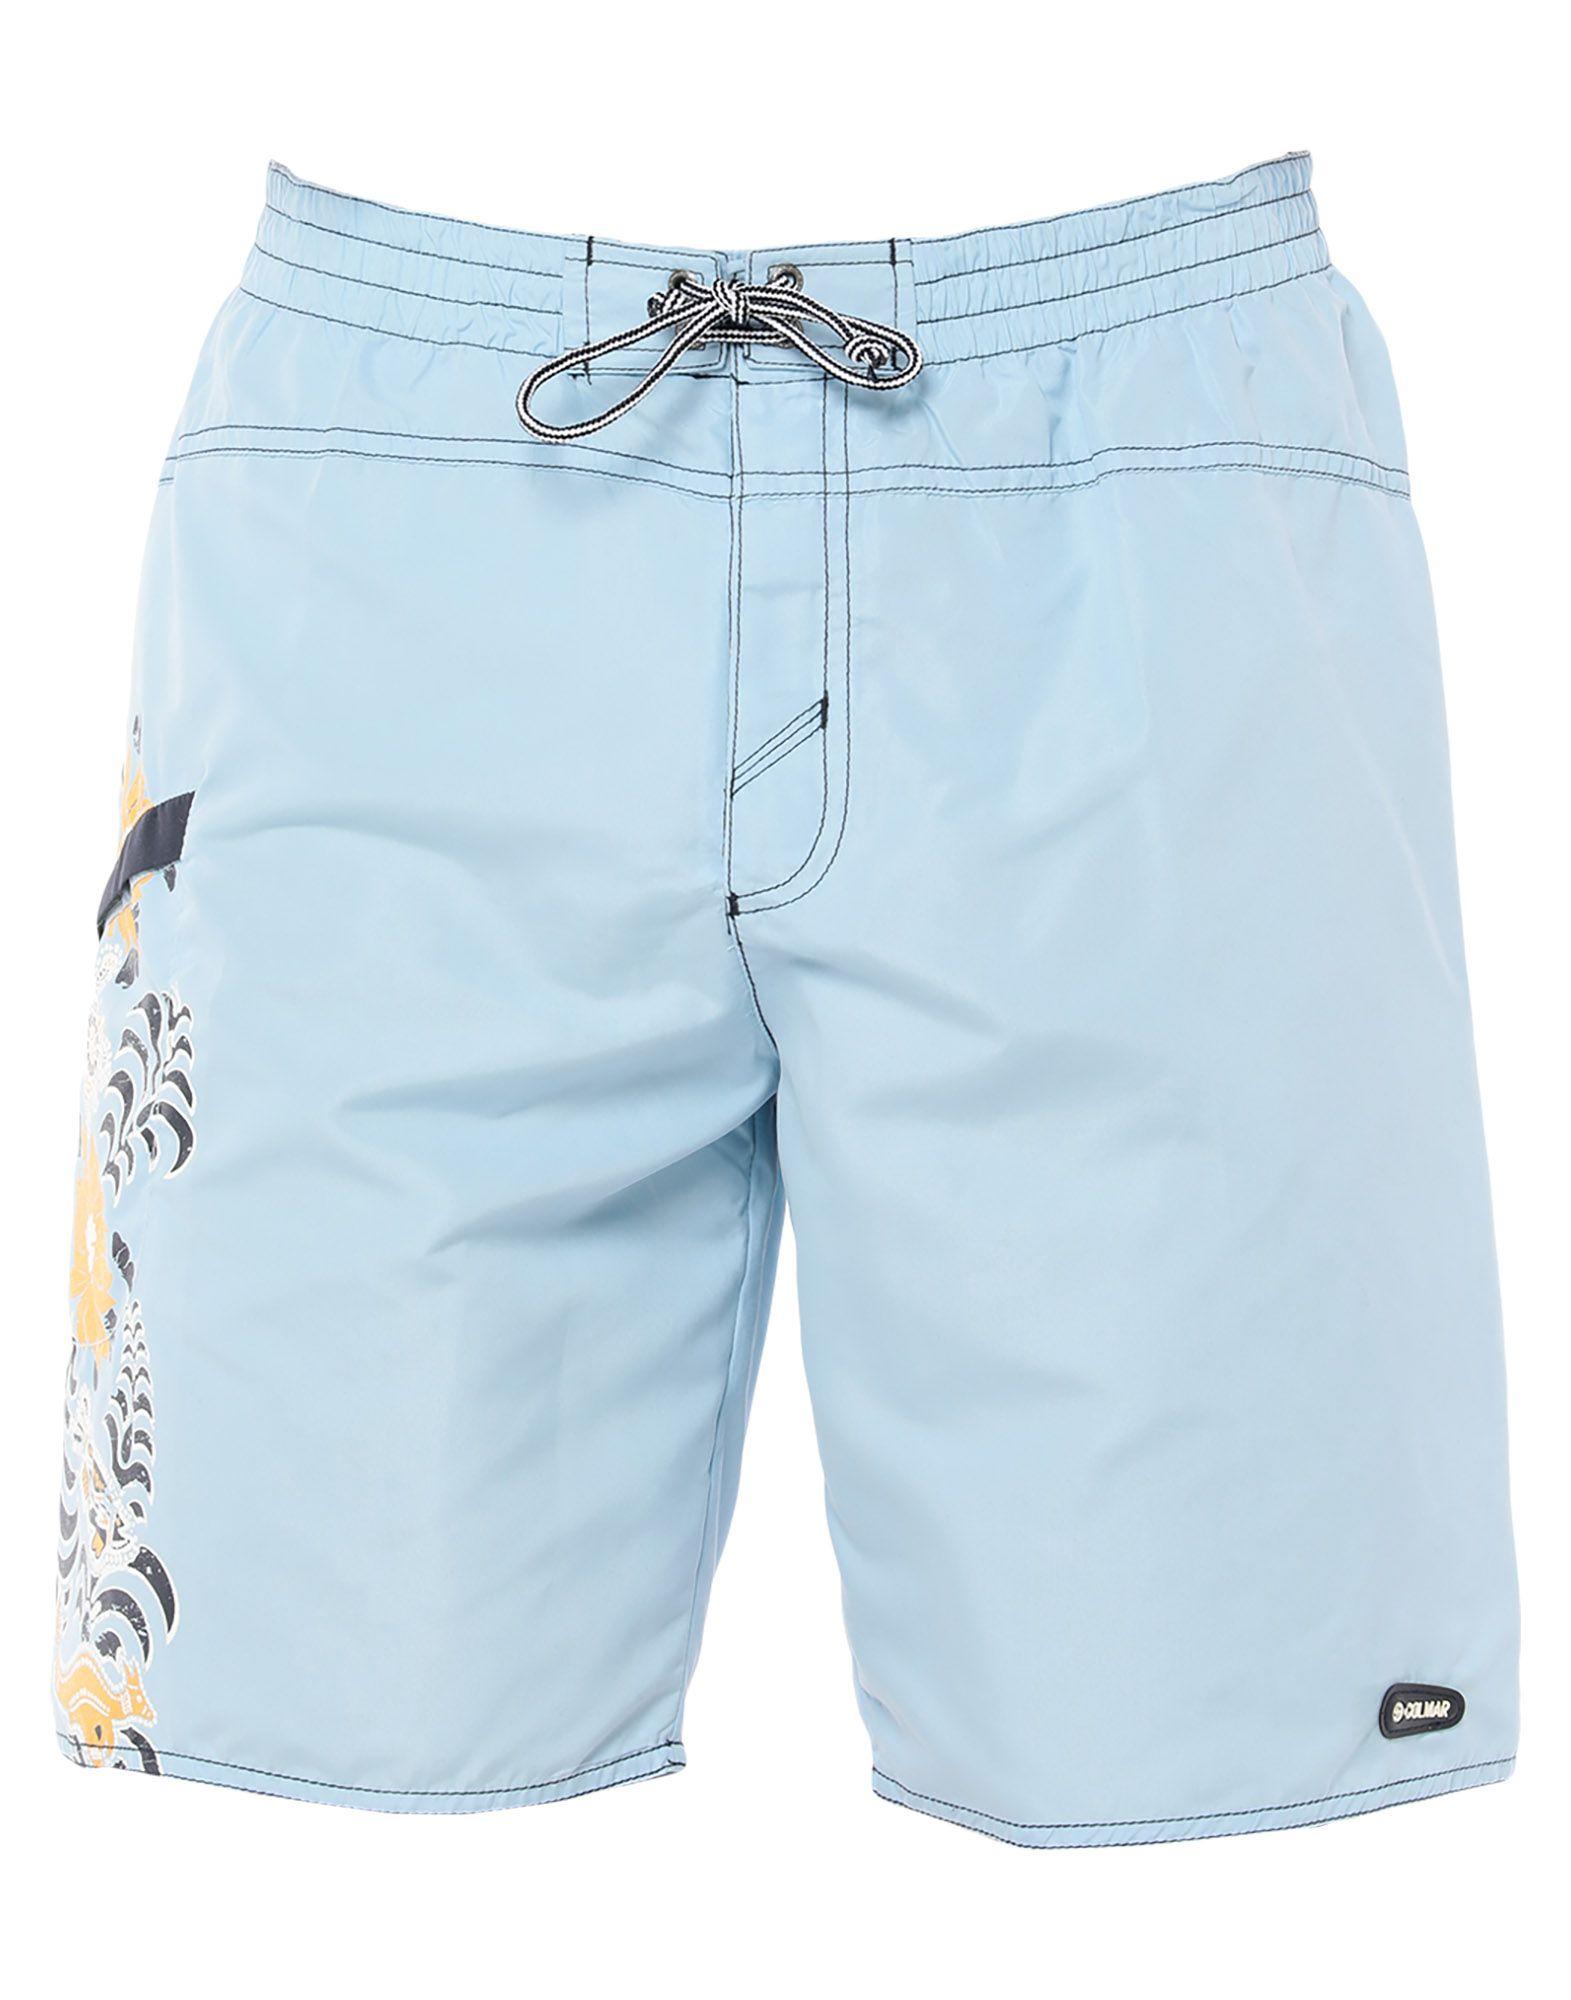 COLMAR Swim trunks - Item 47268290